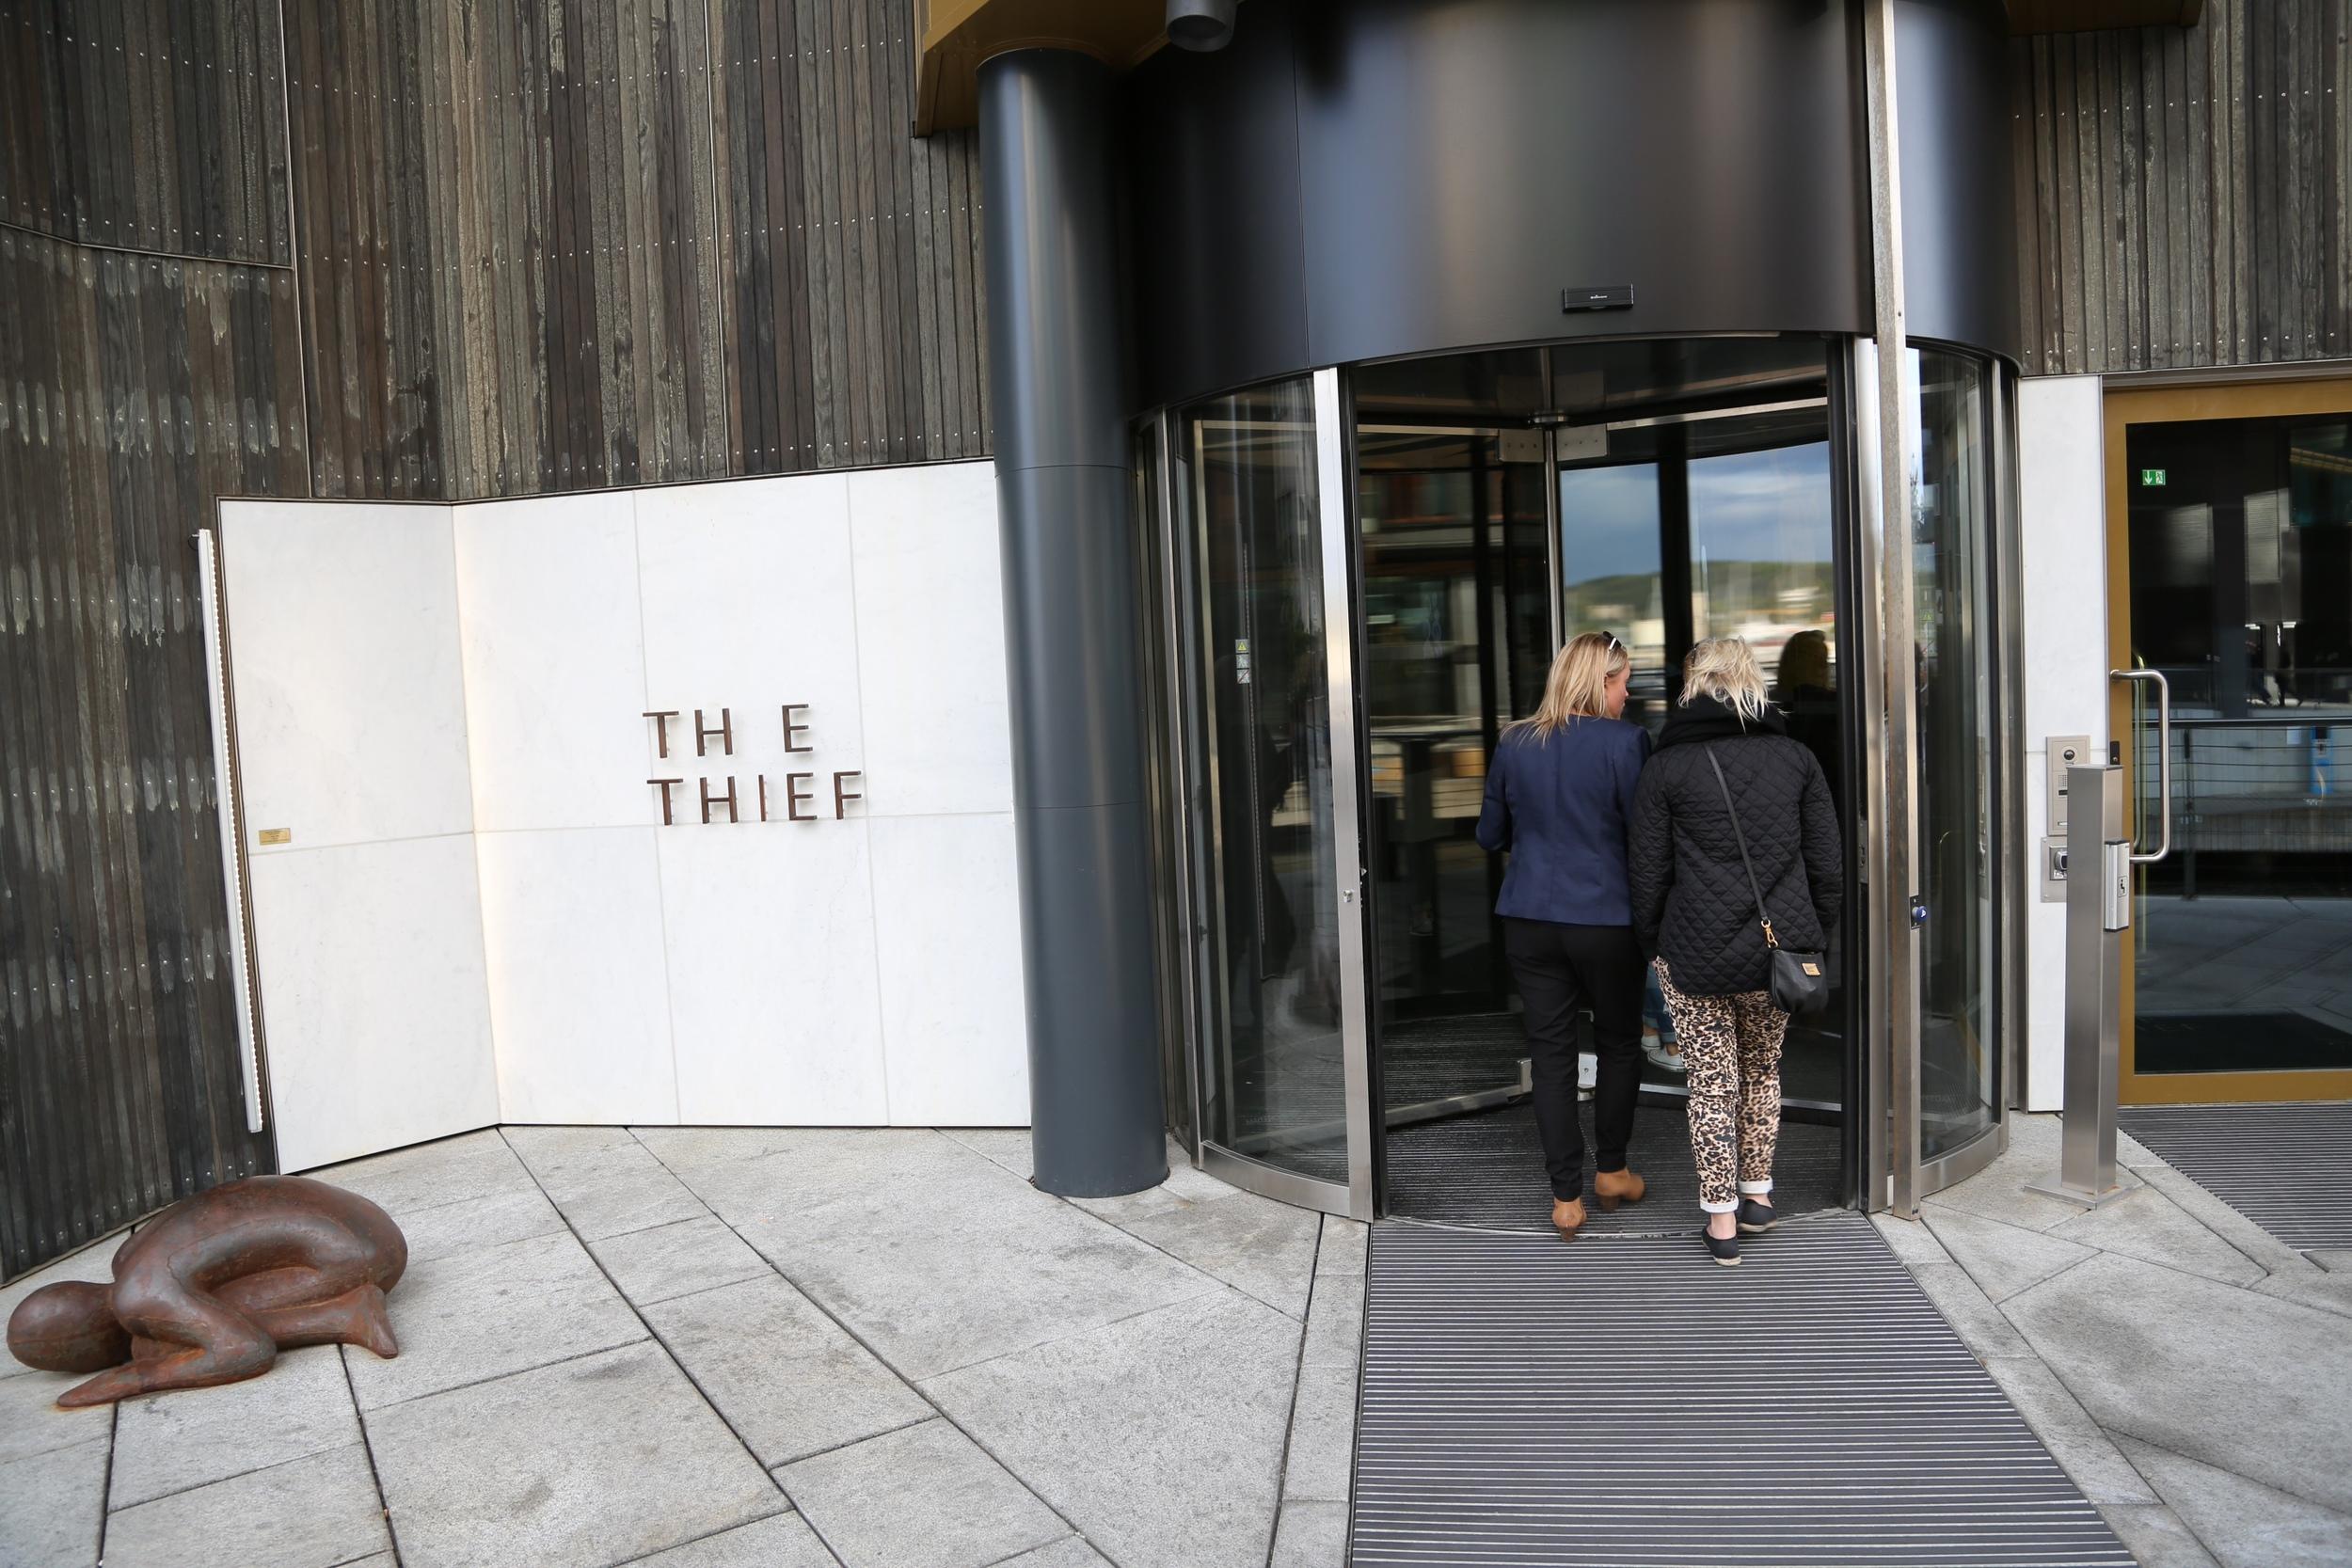 Hotel The Thief på Tjuvholmen i Oslo. Foto: Odd Roar Lange